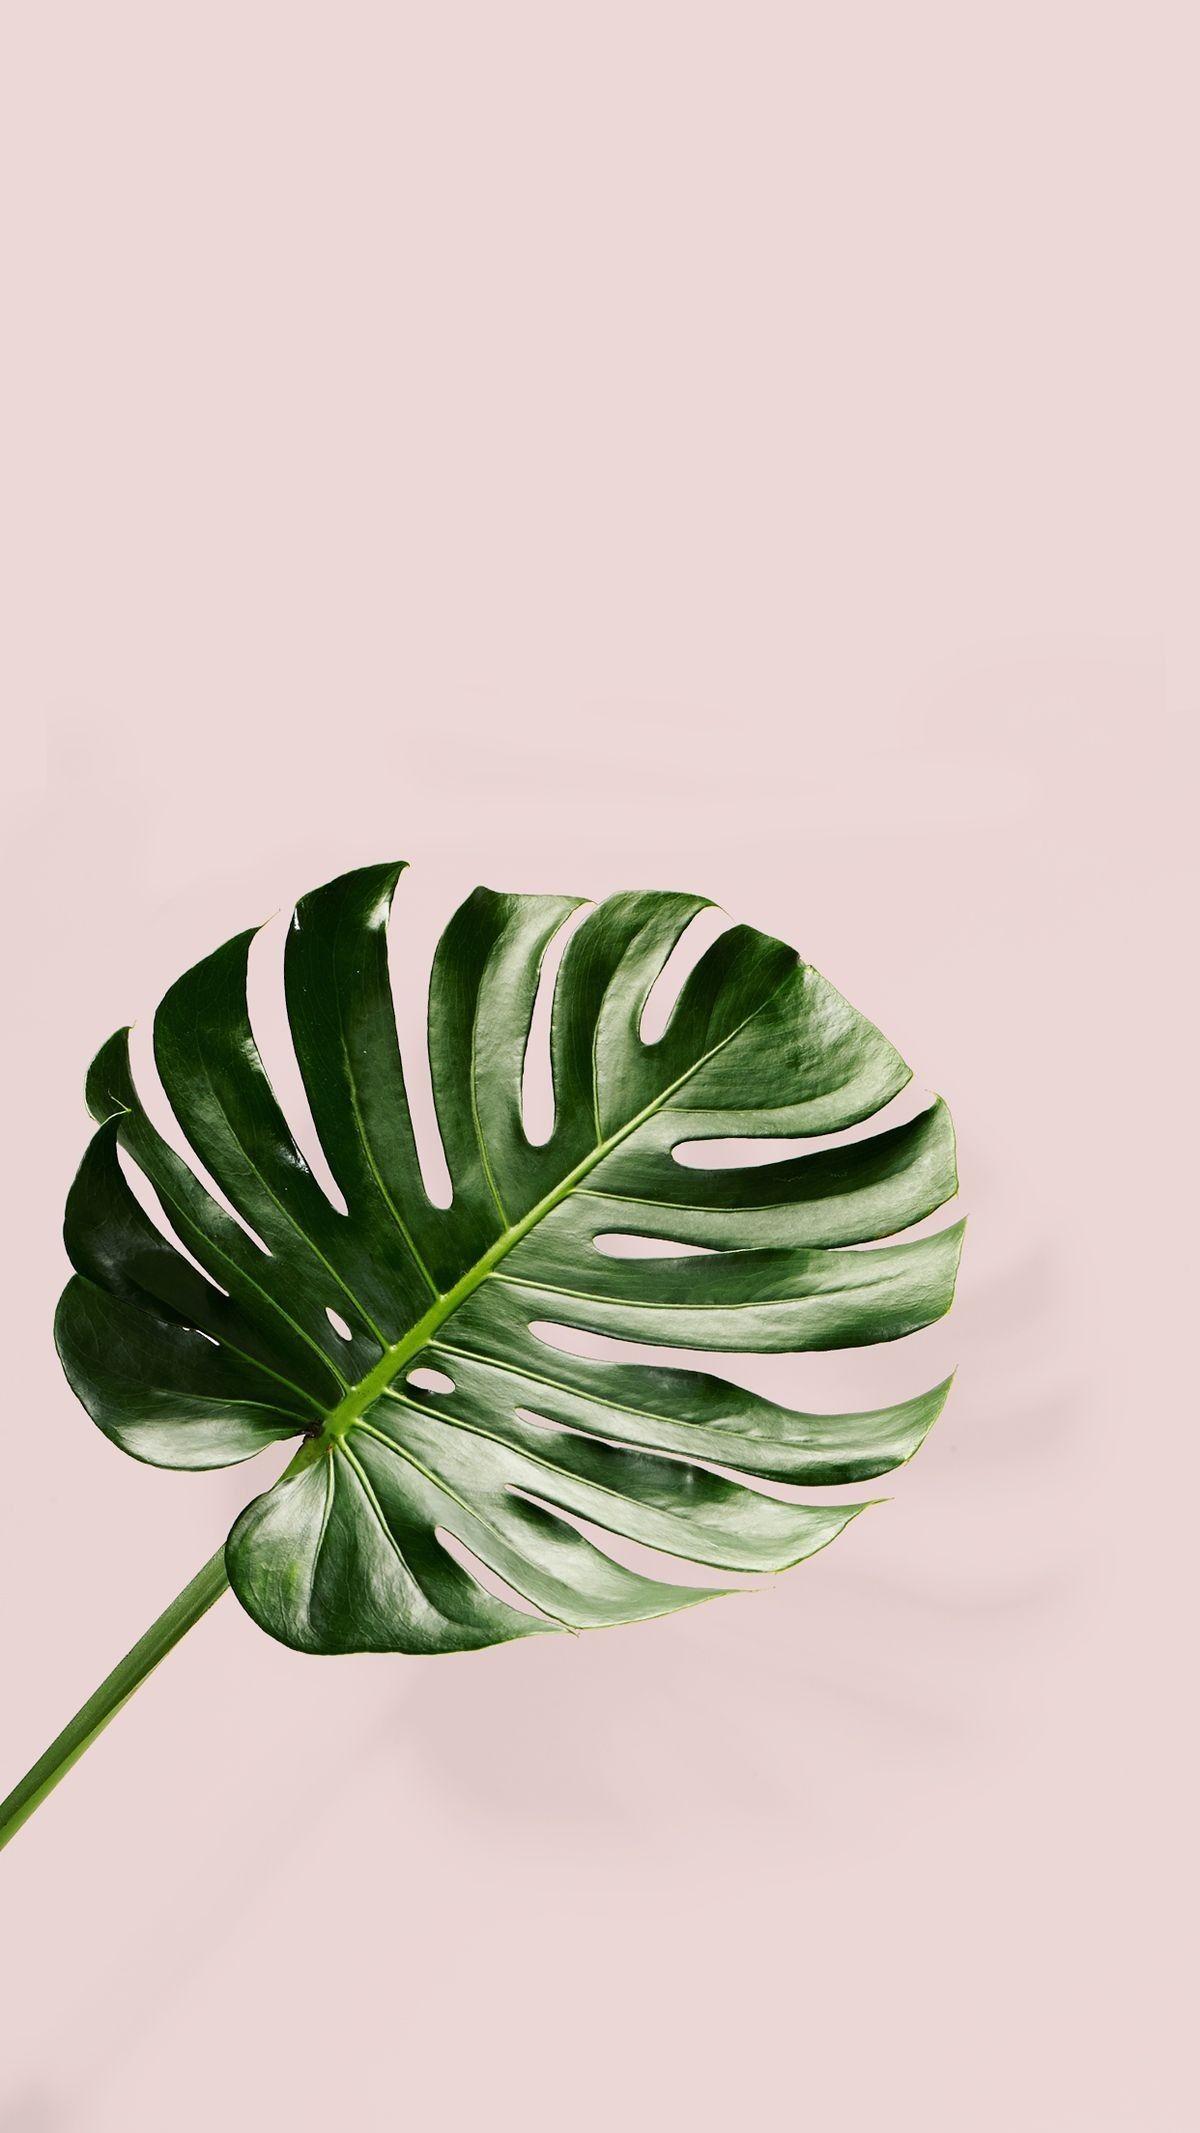 Iphone Wallpaper Plants Desktop Wallpapers Tumblr Tropical 6 7 Backgrounds Phone Lockscreen